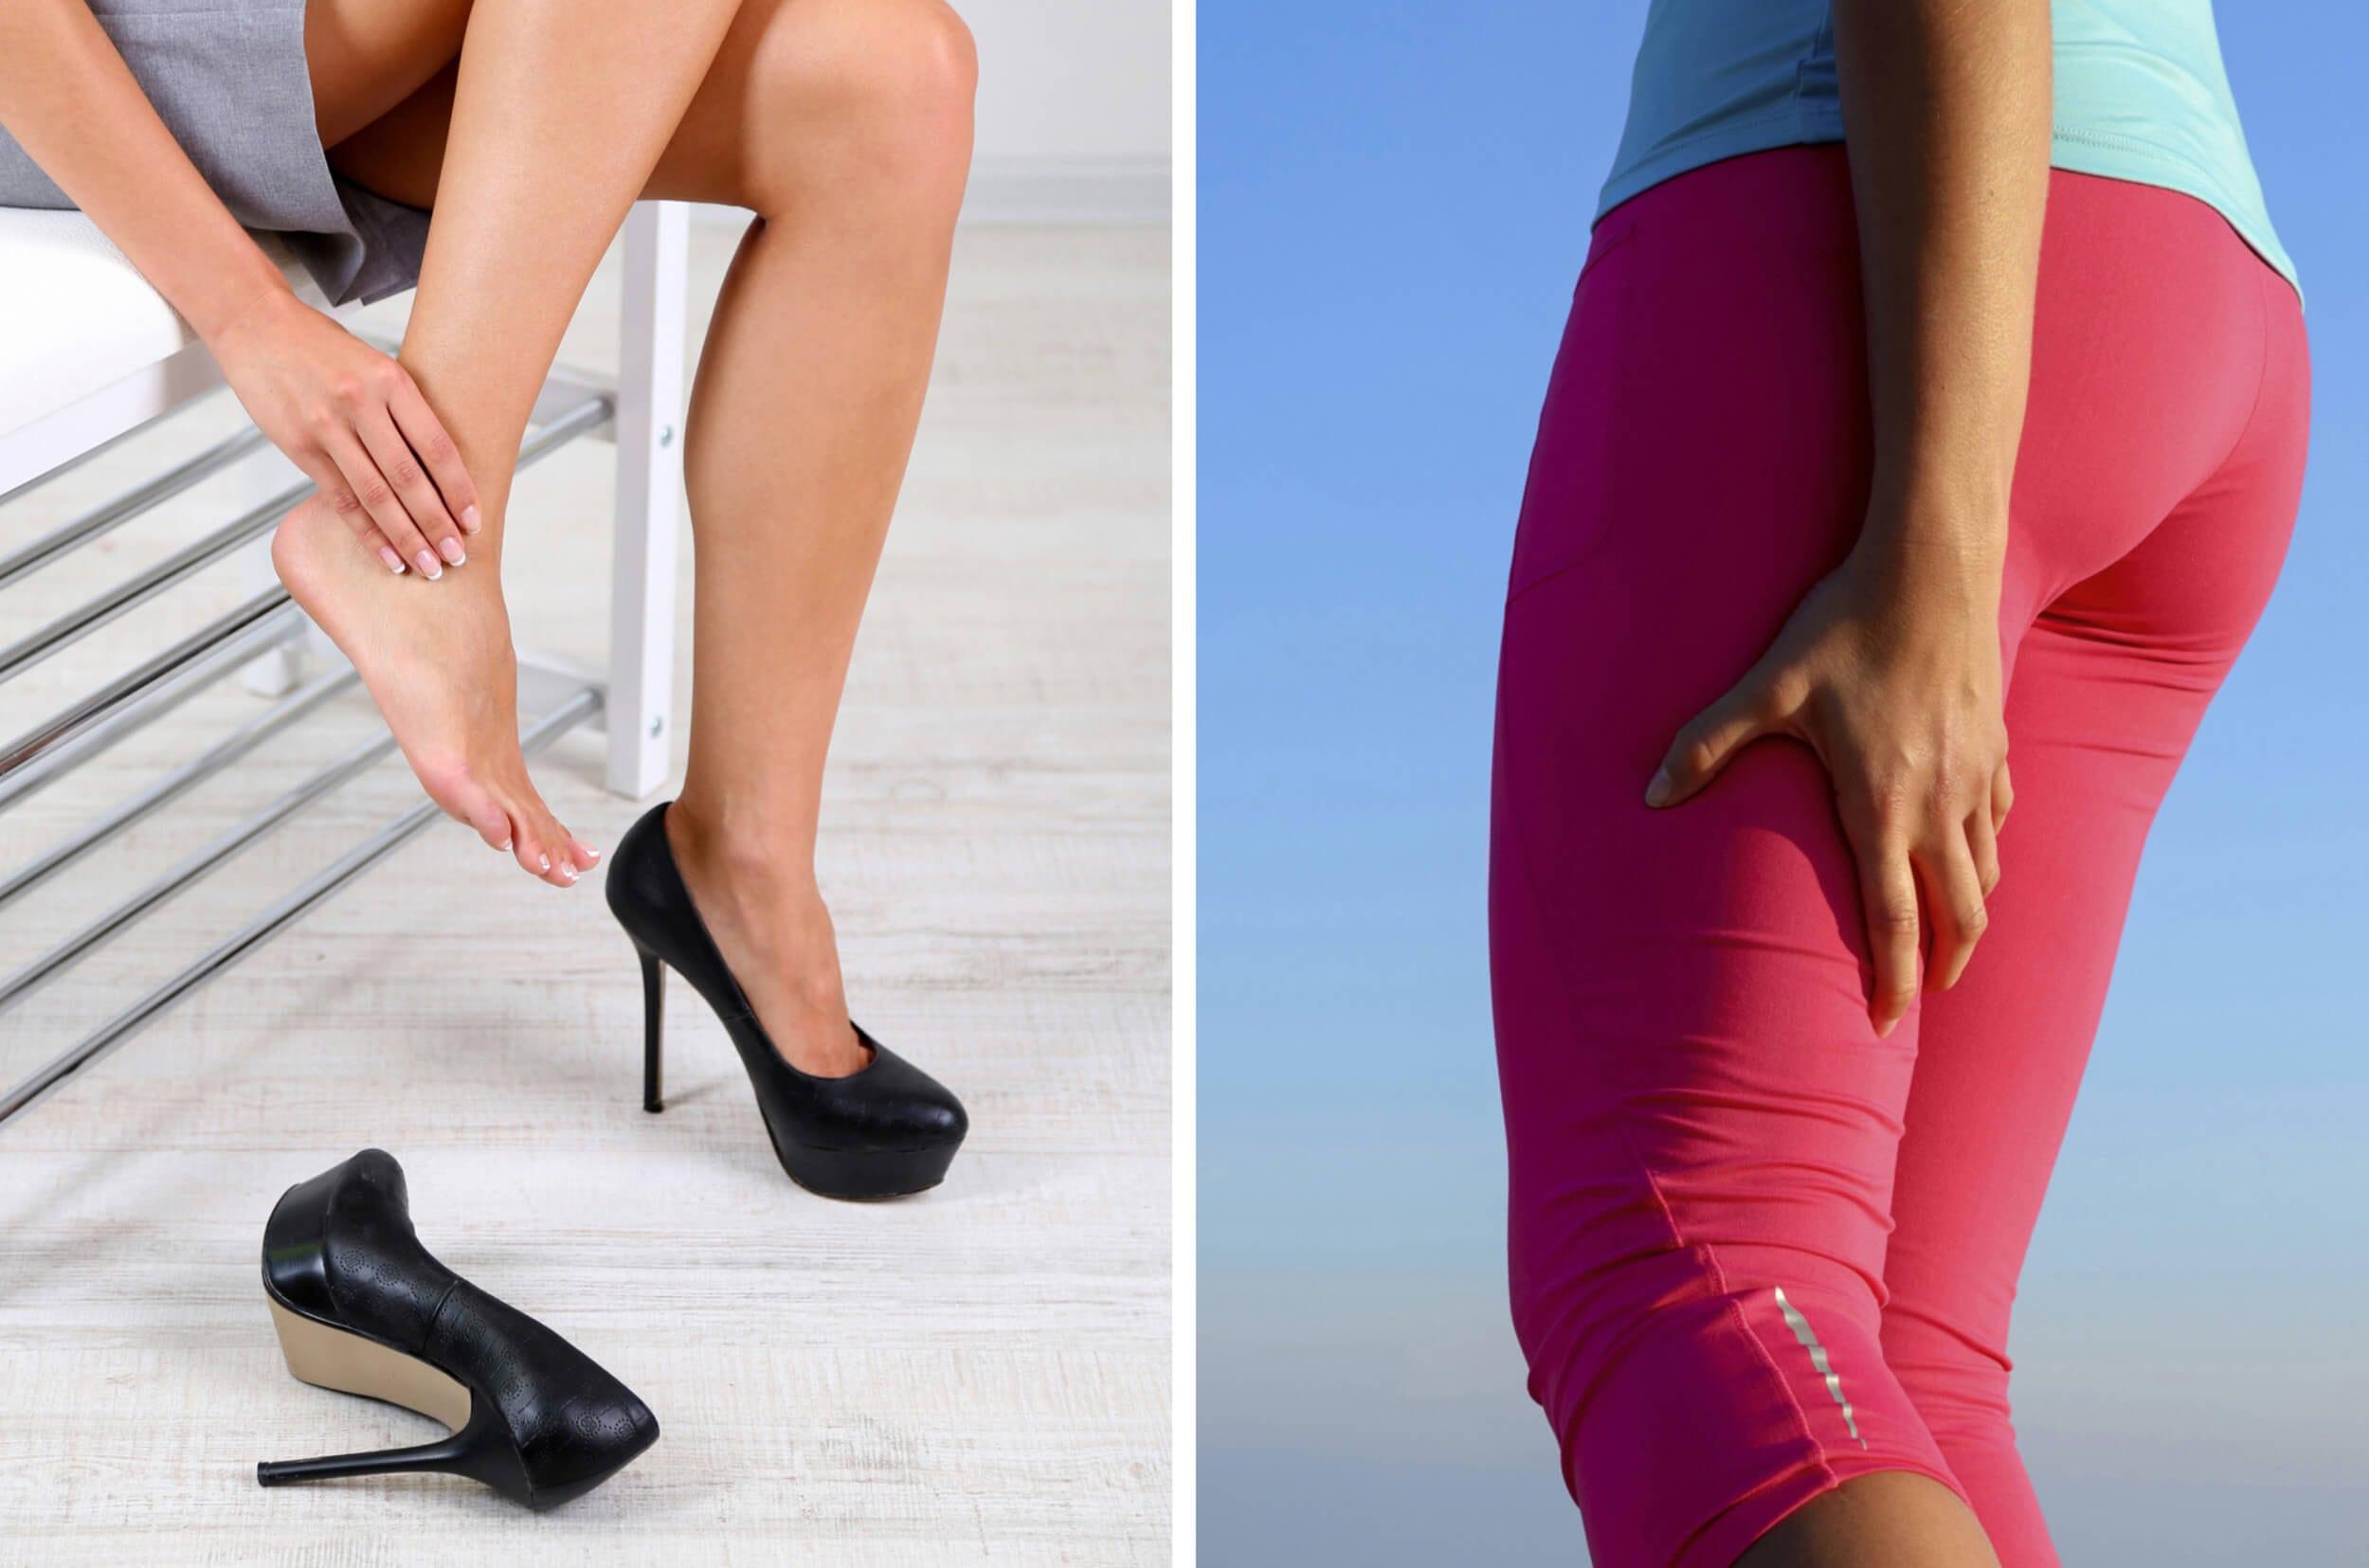 Ногу сводит судорога ночью причина и лечение